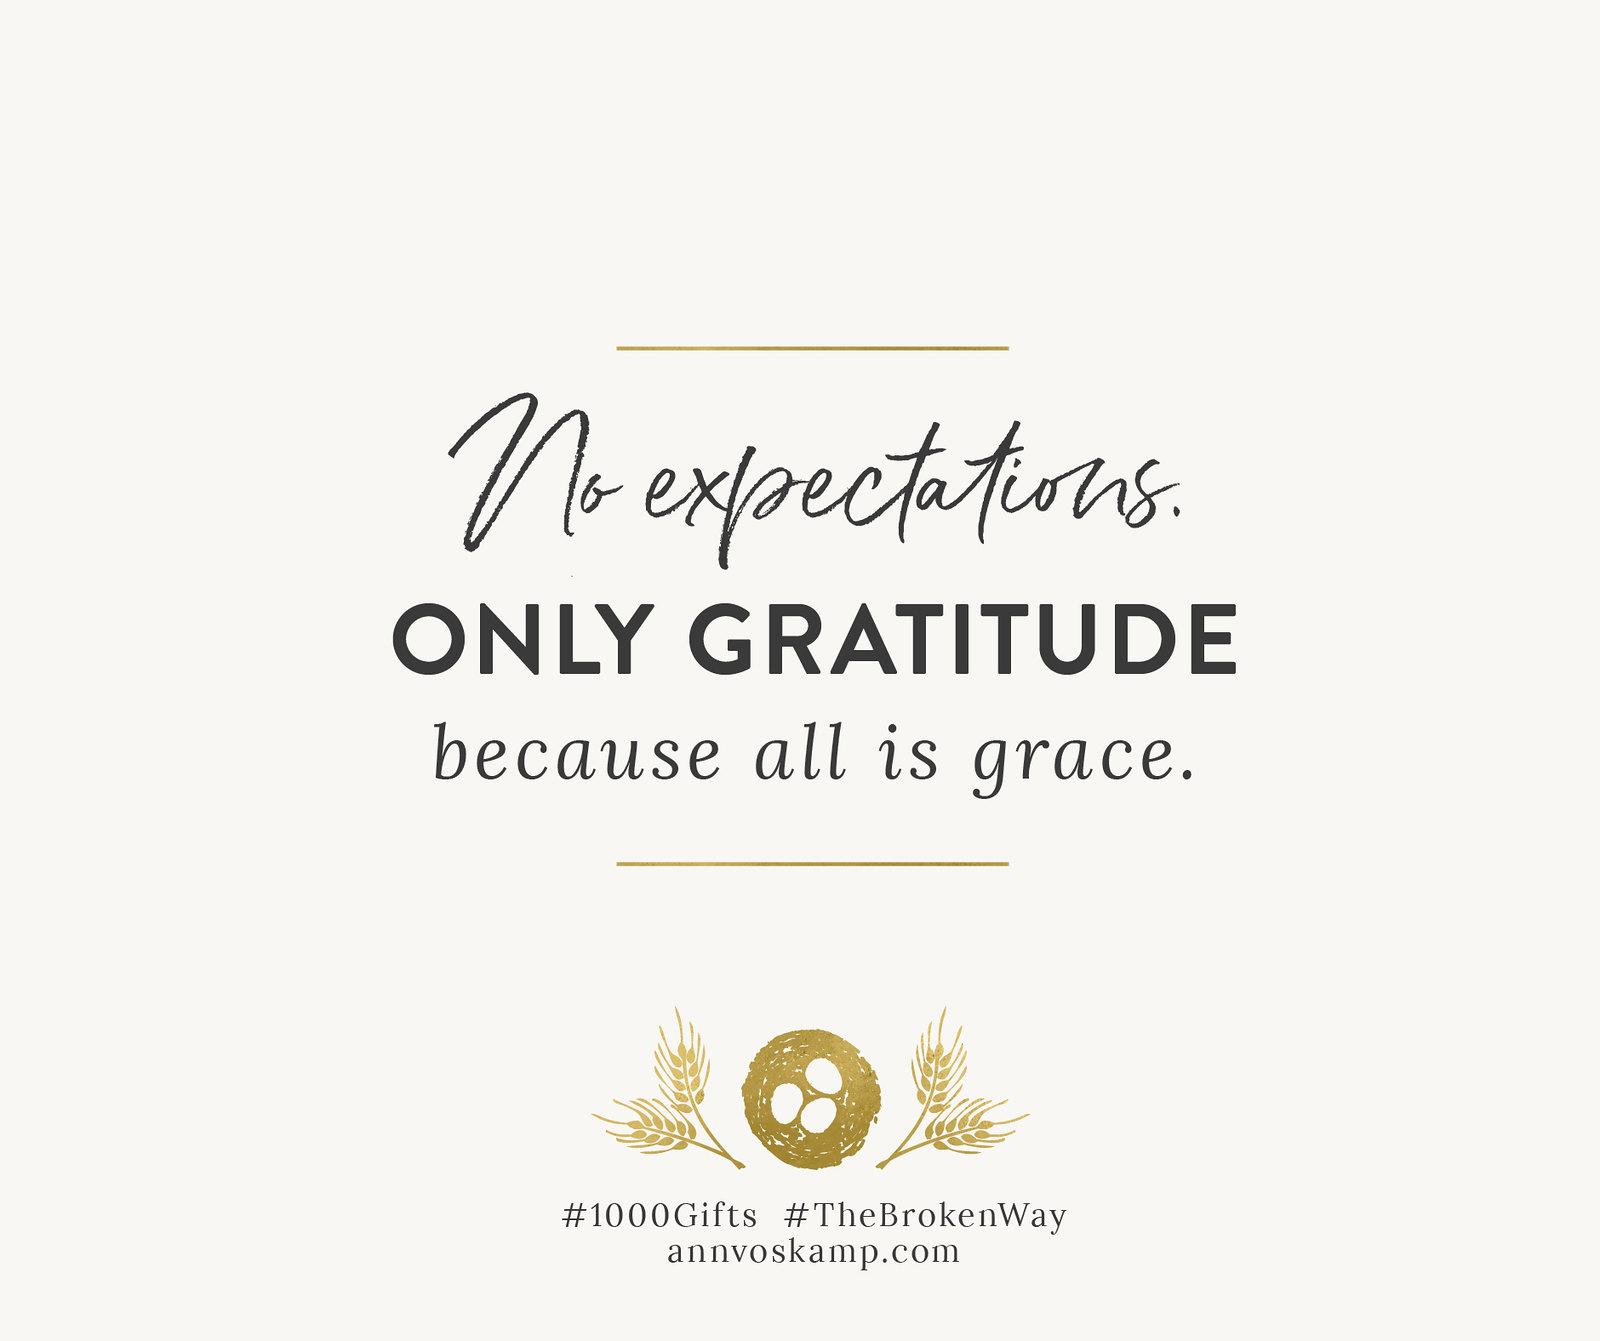 FB_Gratefulness_NoExpectations-1